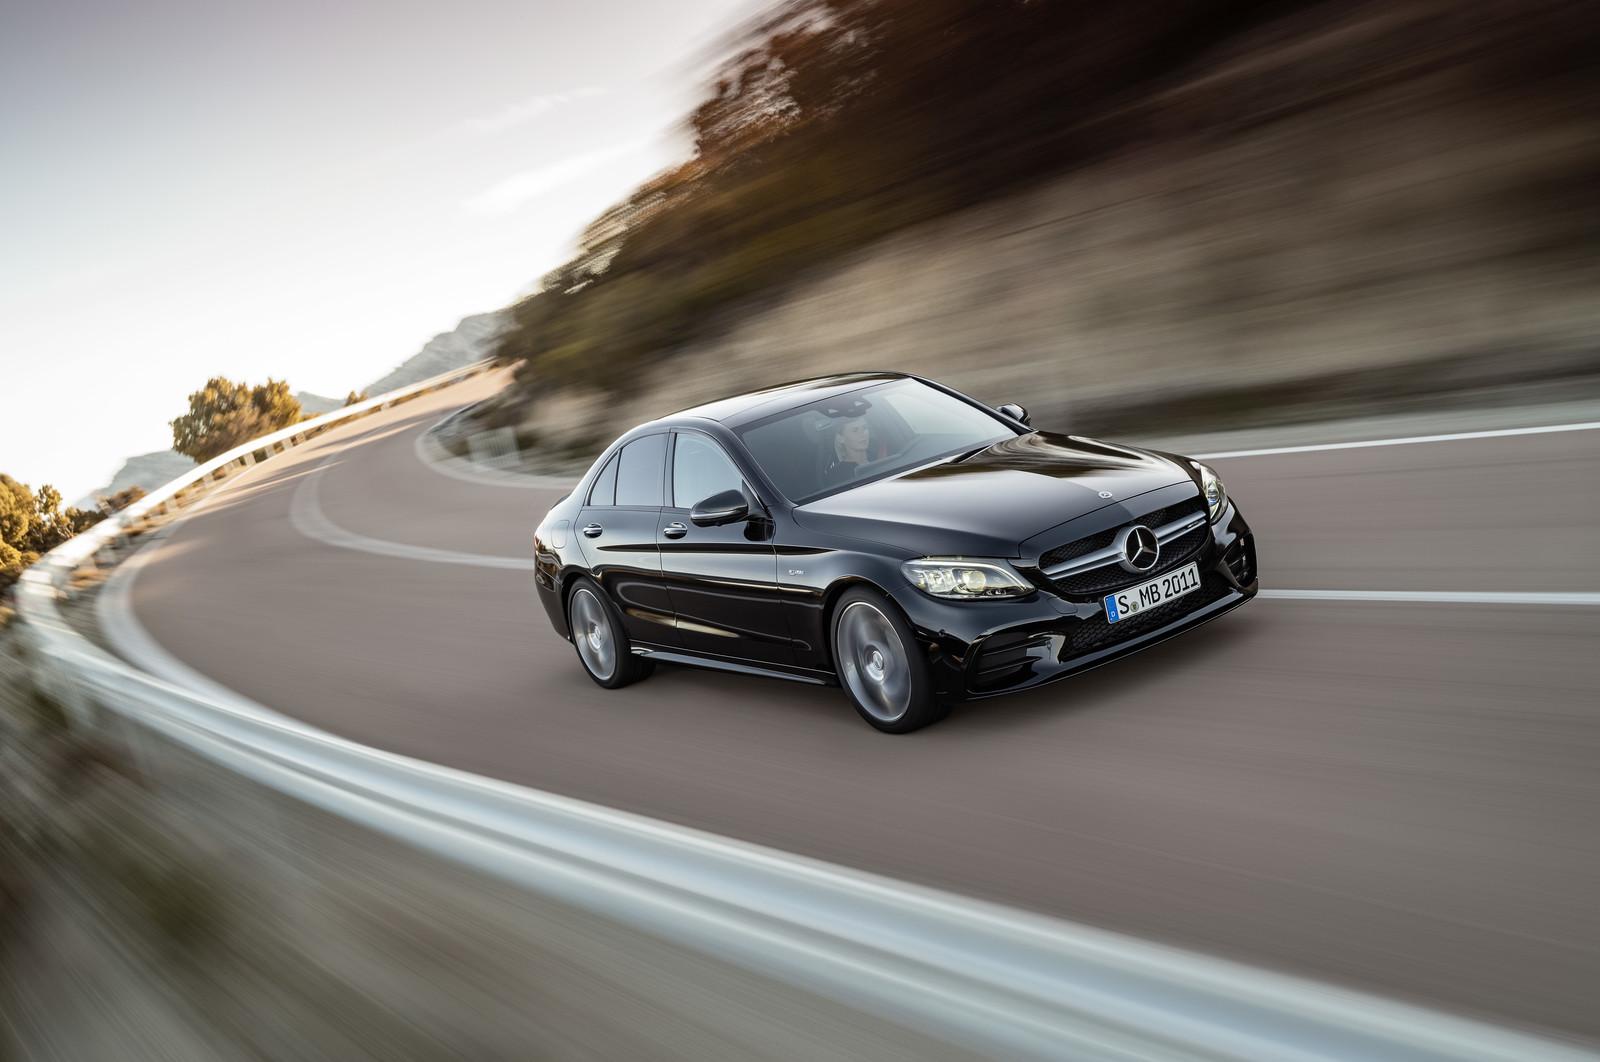 Mercedes-AMG C 43 4MATIC 2018